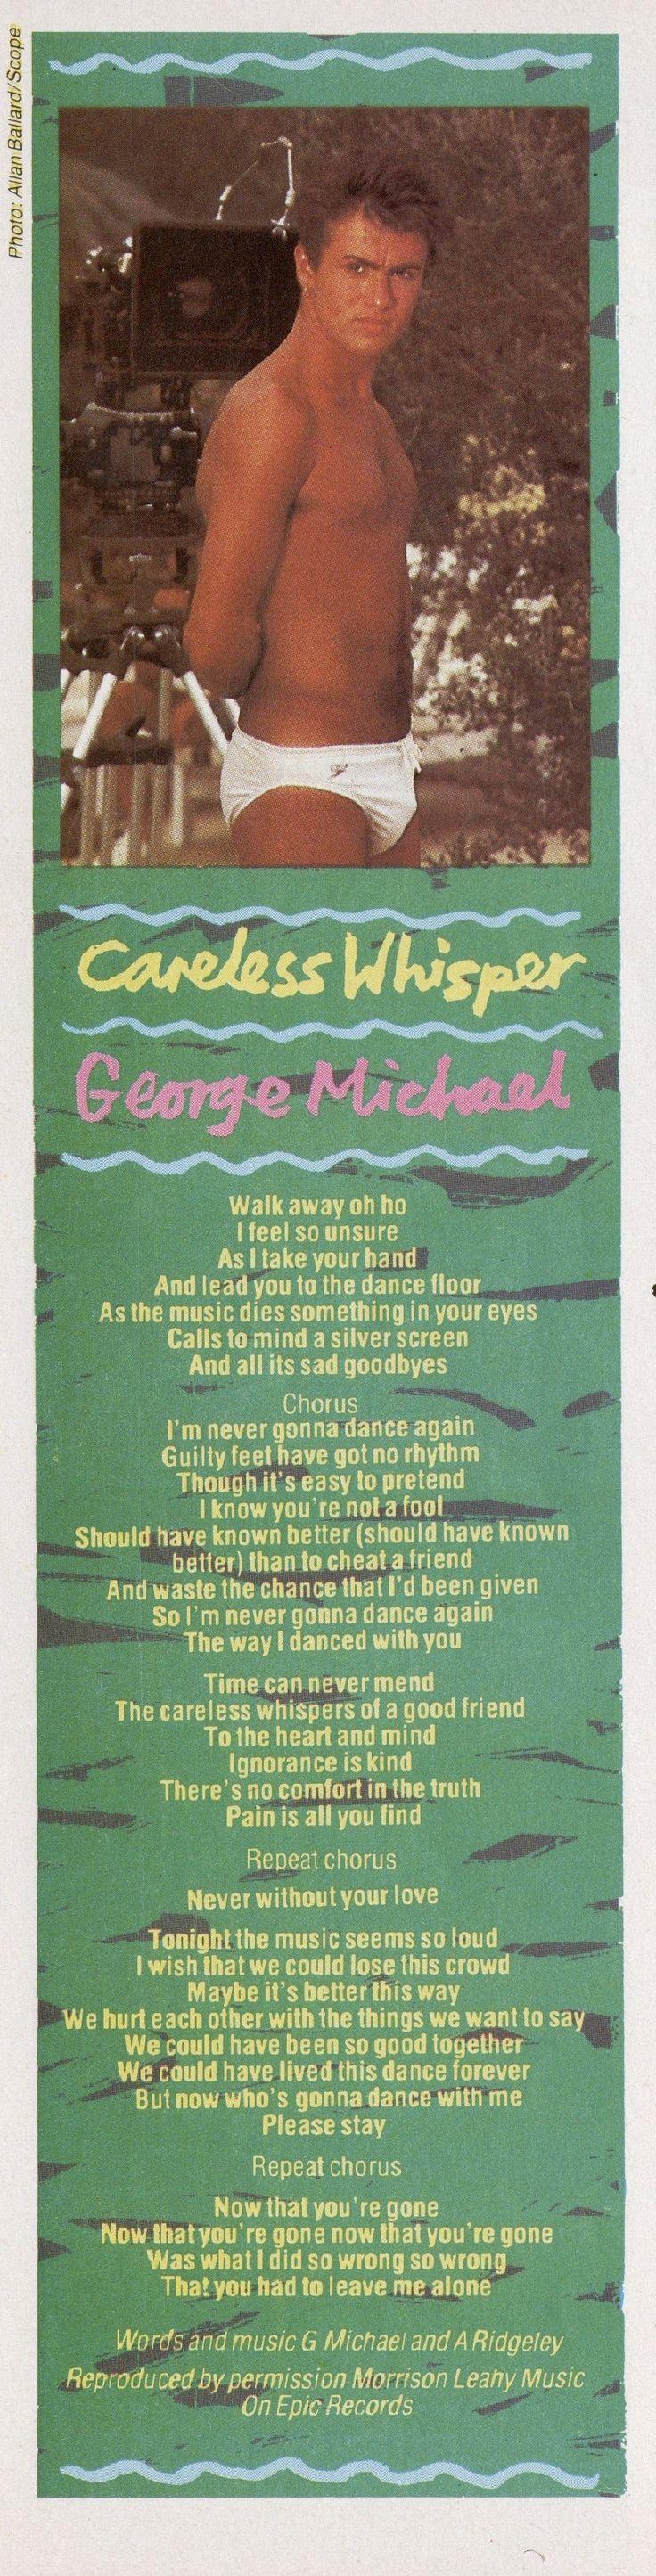 George Michael - Careless Whisper , 1984